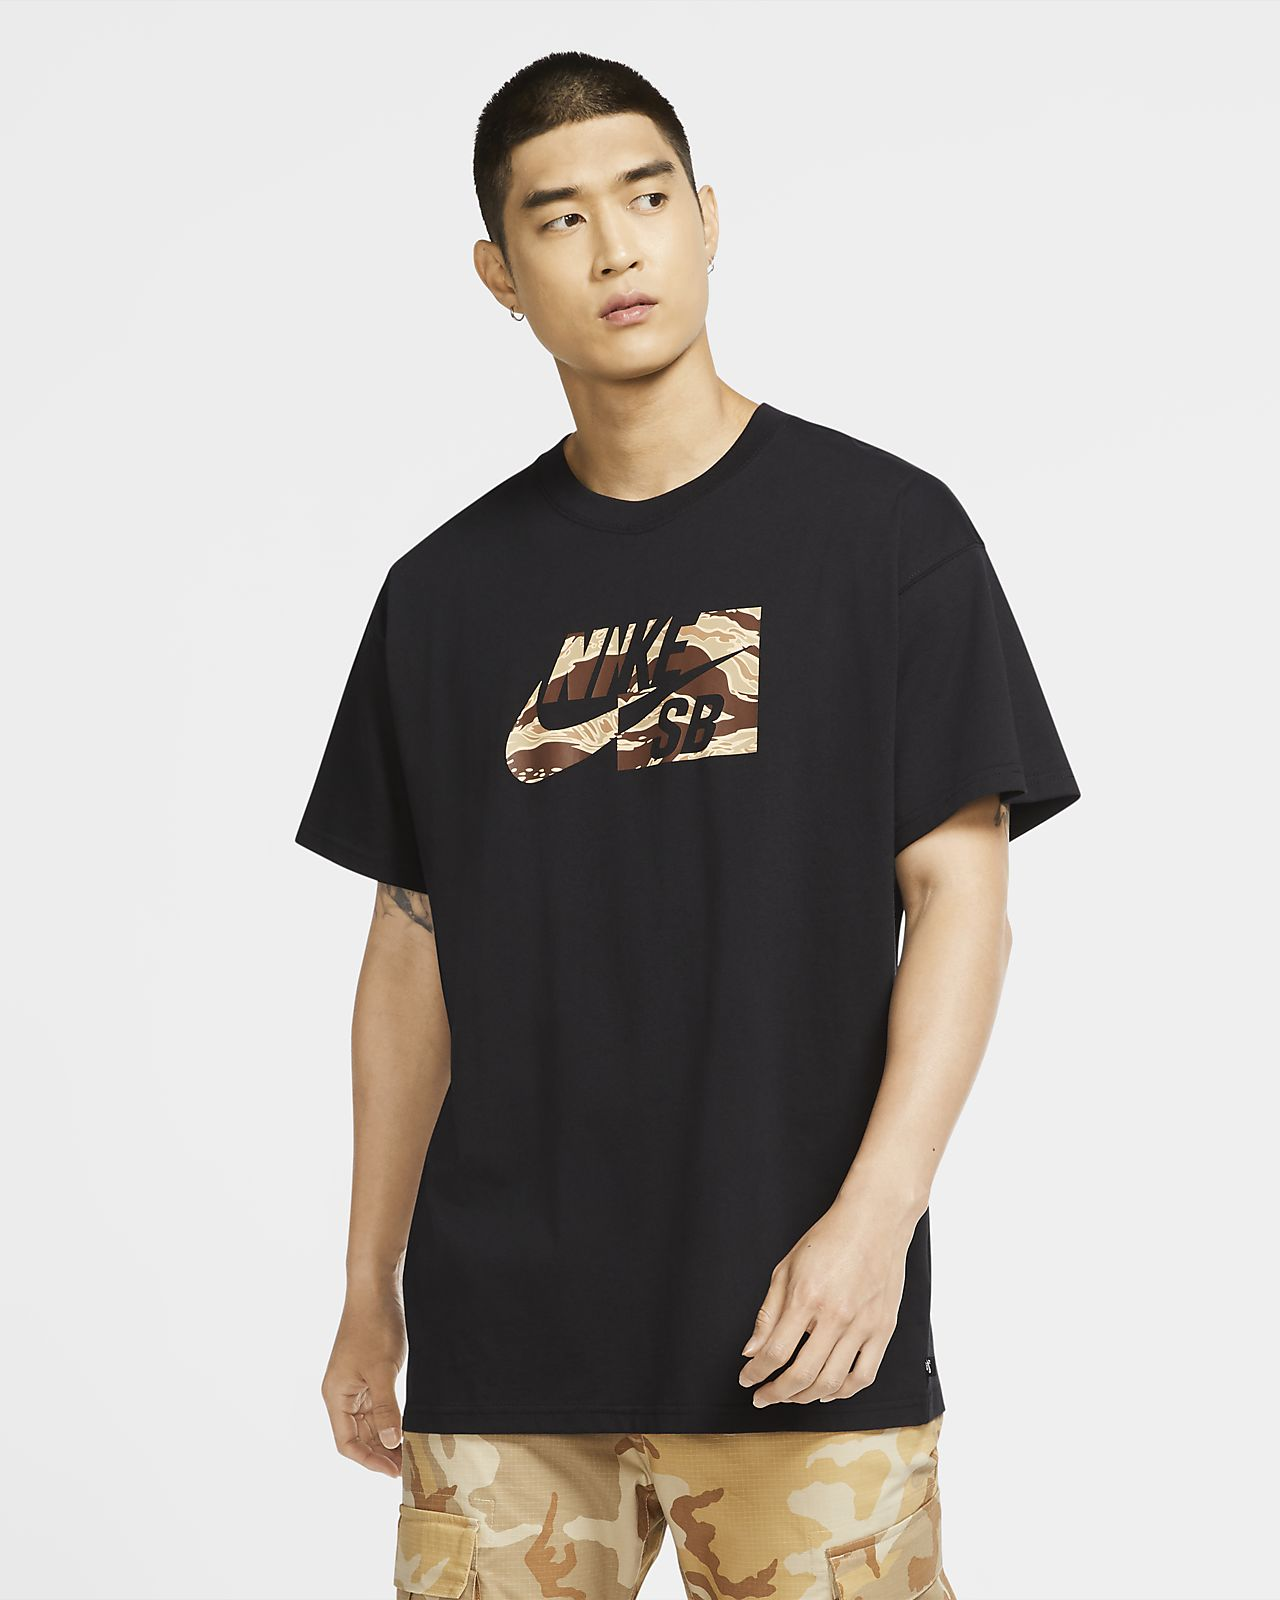 Playera de skateboarding camuflada para hombre Nike SB